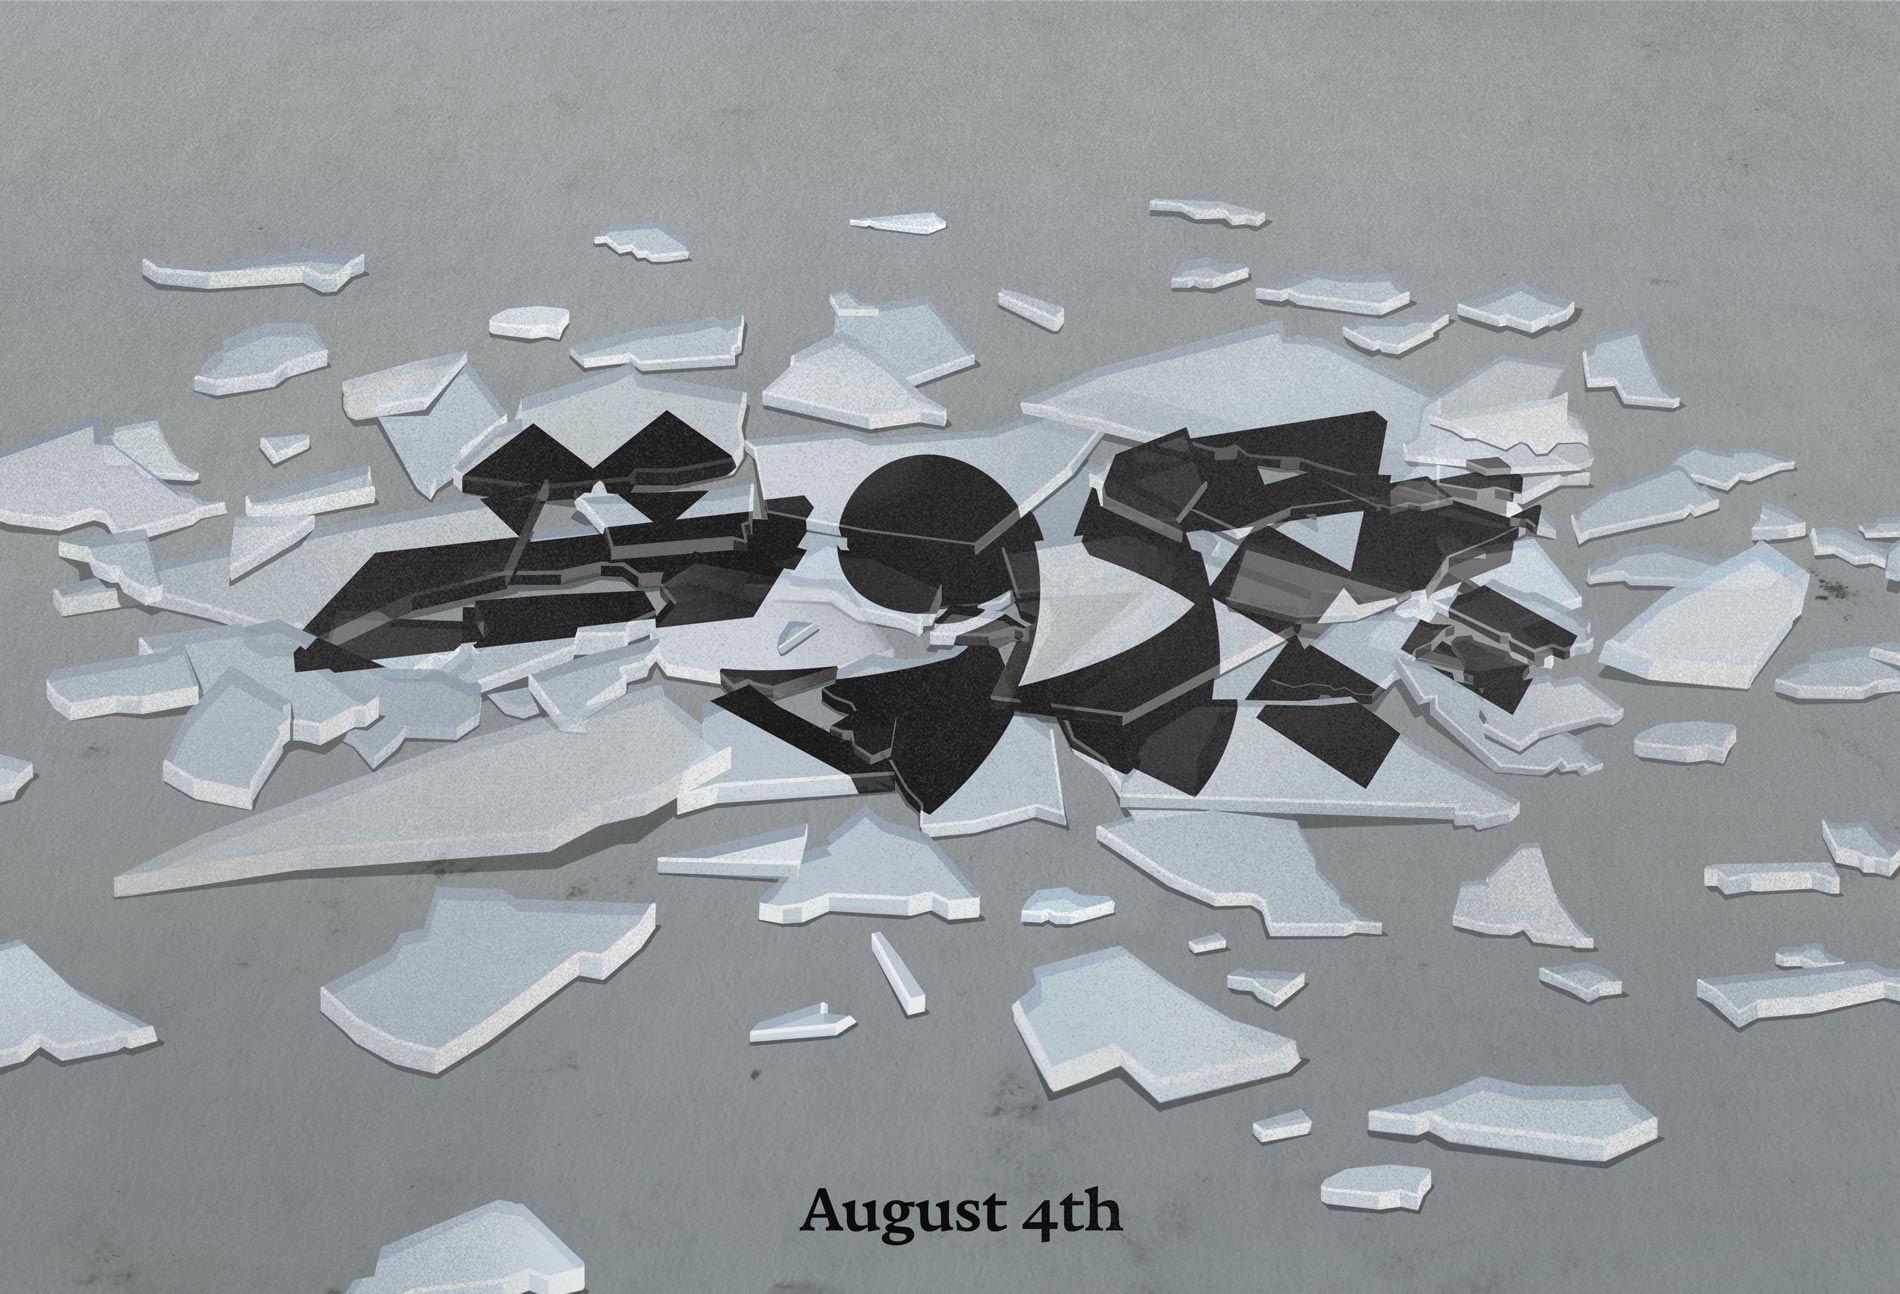 beirut blast illustration broken glass